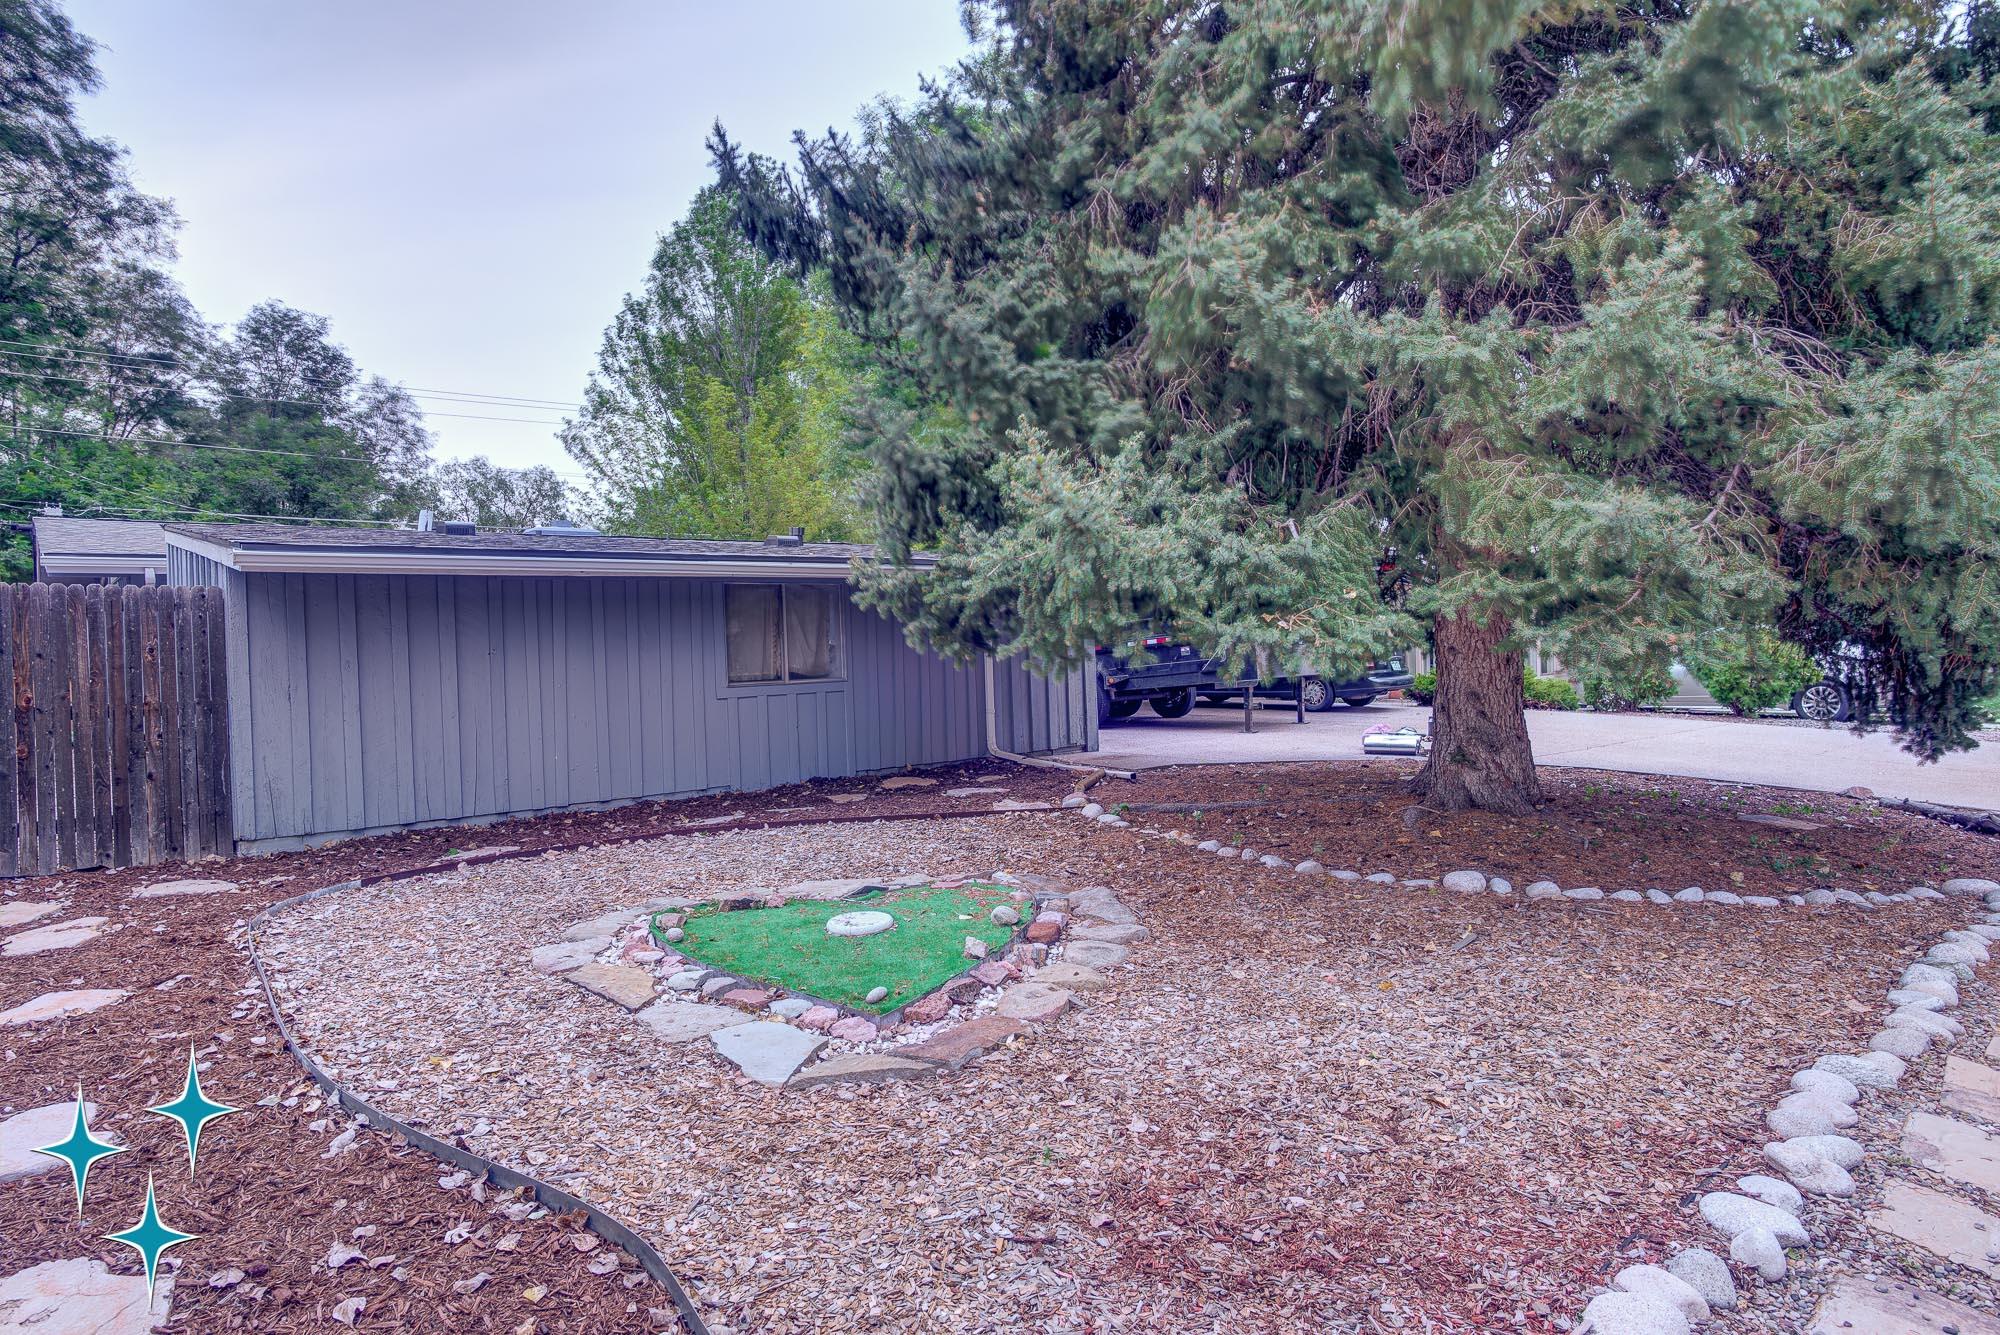 Adrian-Kinney-2360-S-Newton-Street-Denver-Cliff-May-Harvey-Park-2000w50-3SWM--4.jpg